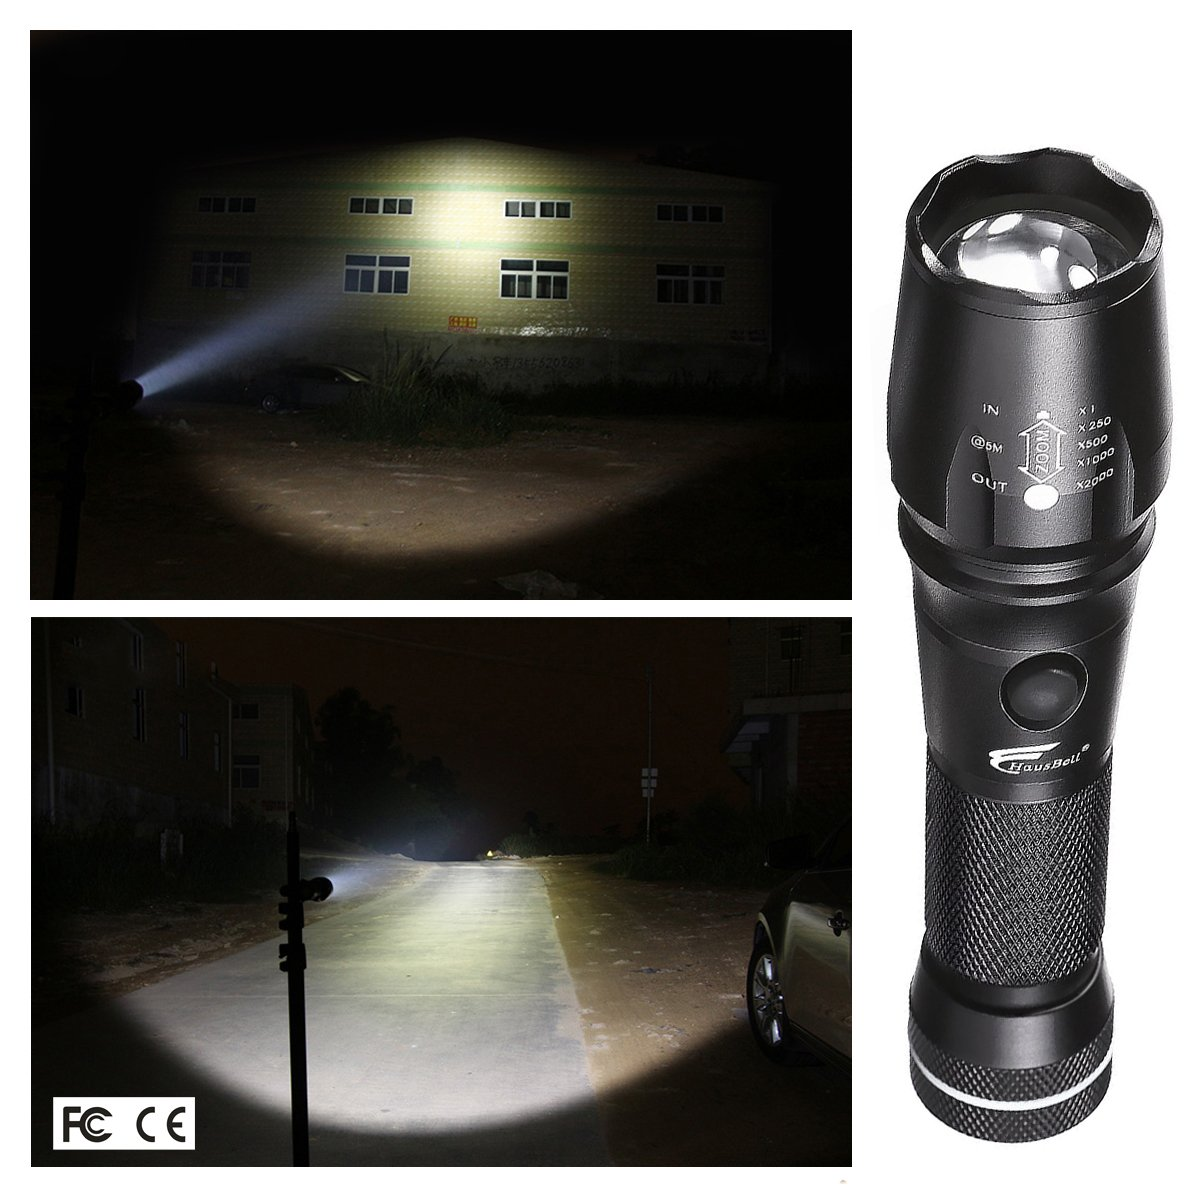 Flashlights,Hausbell Magnet Base T6-C 1000lumen LED Flashlight 3 Modes Zoomable